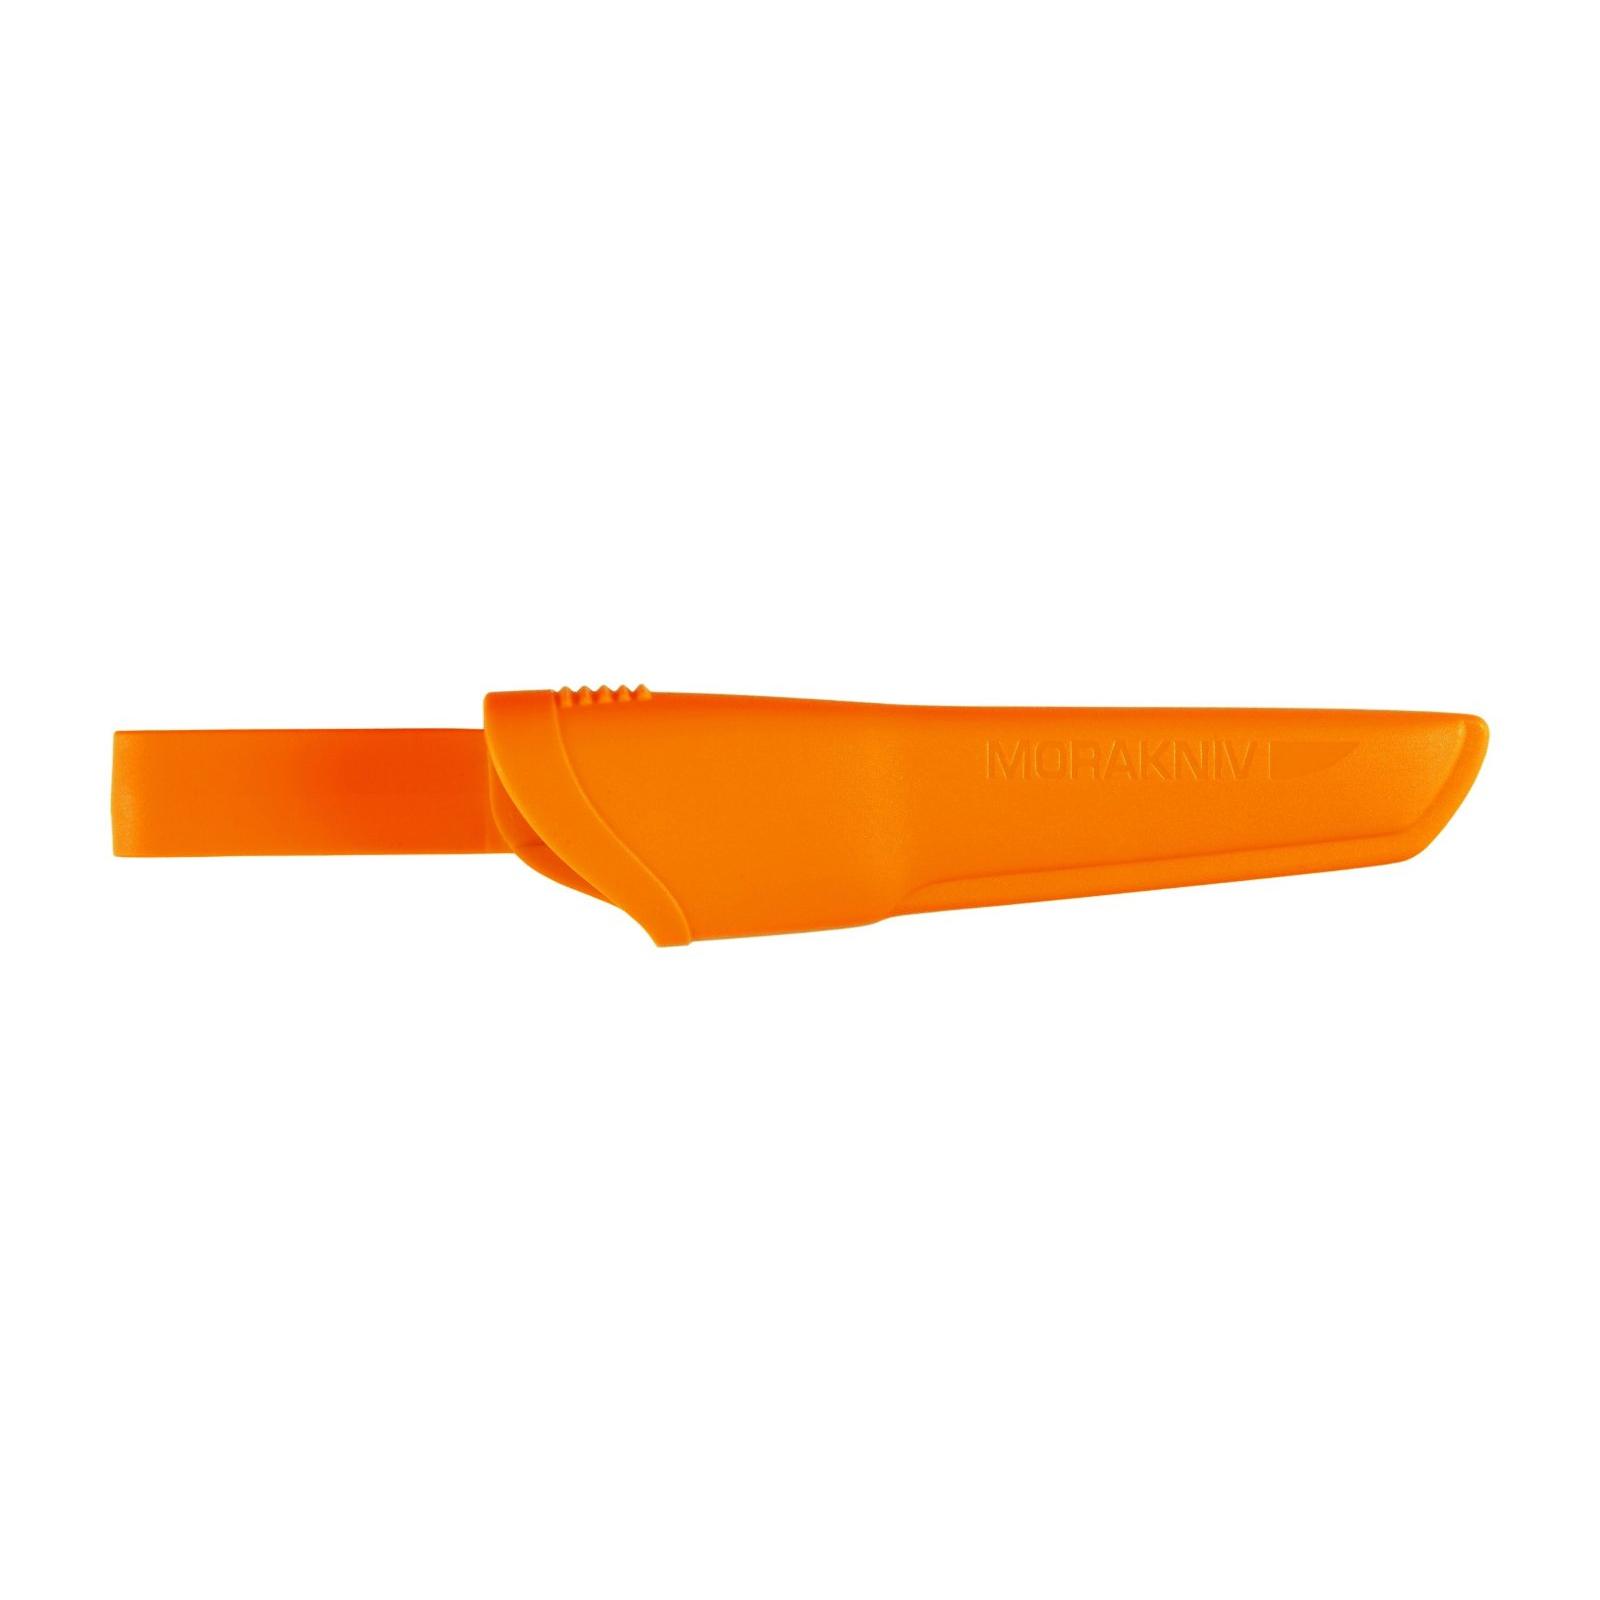 Нож Morakniv Bushcraft Orange (12050) изображение 2